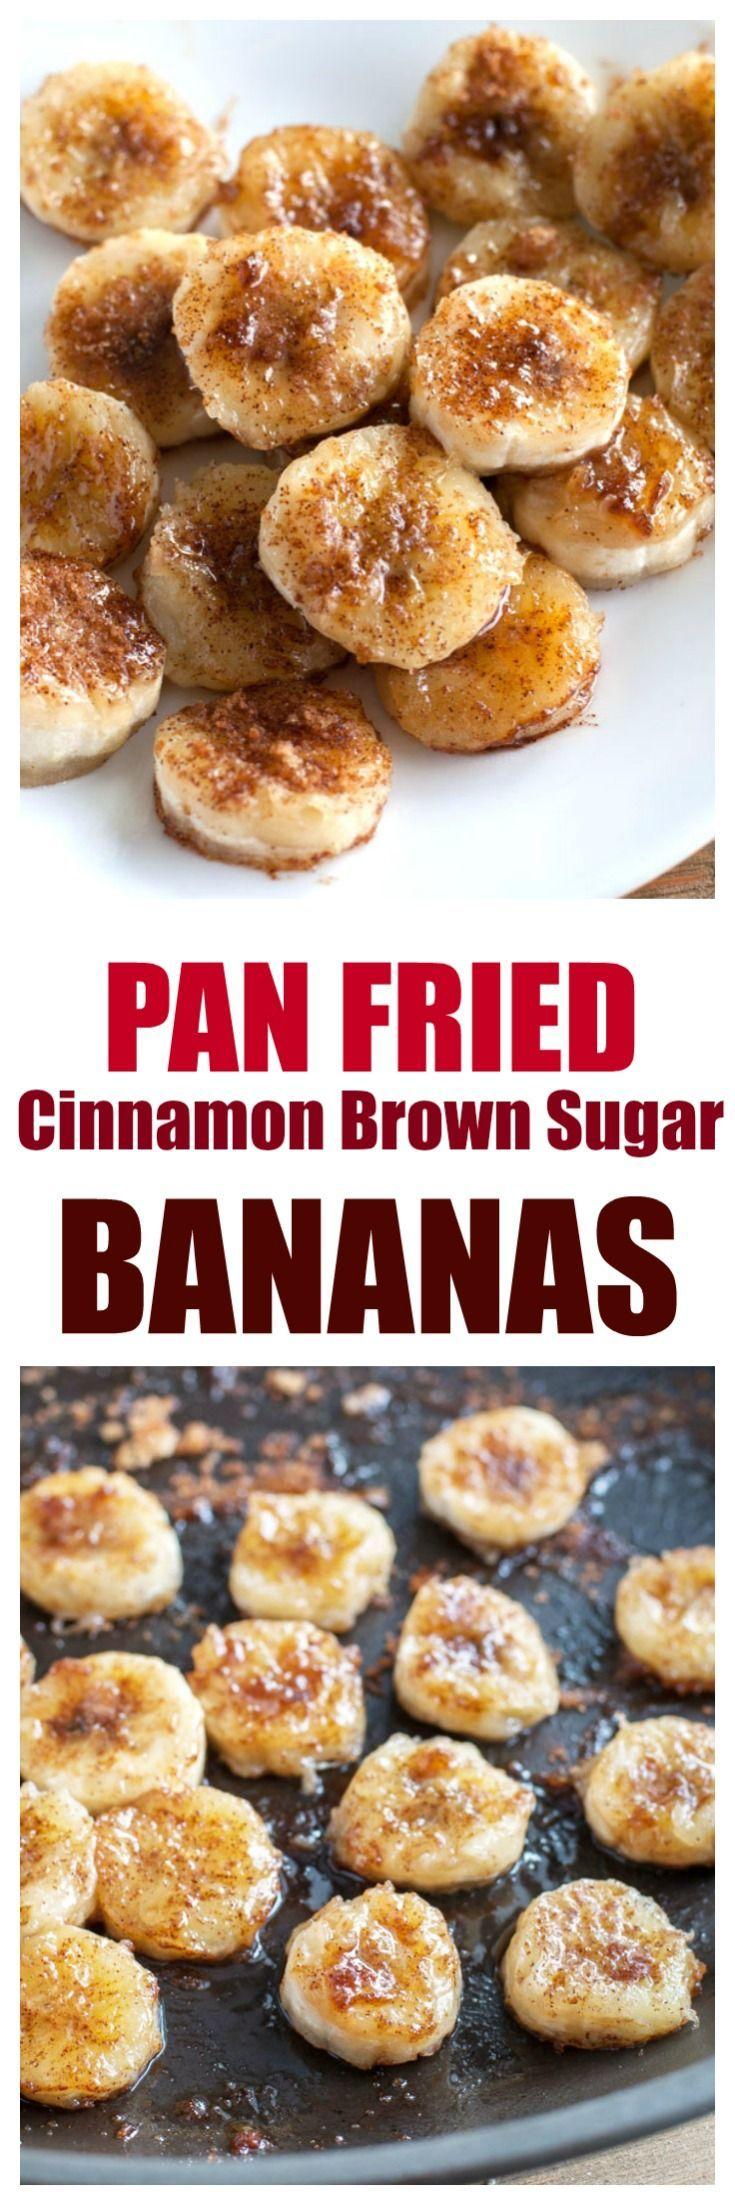 Fried Bananas are a sweet and simple treat made with ripe bananas, cinnamon and brown sugar. #bananas #friedbananas #easydessert #dessert